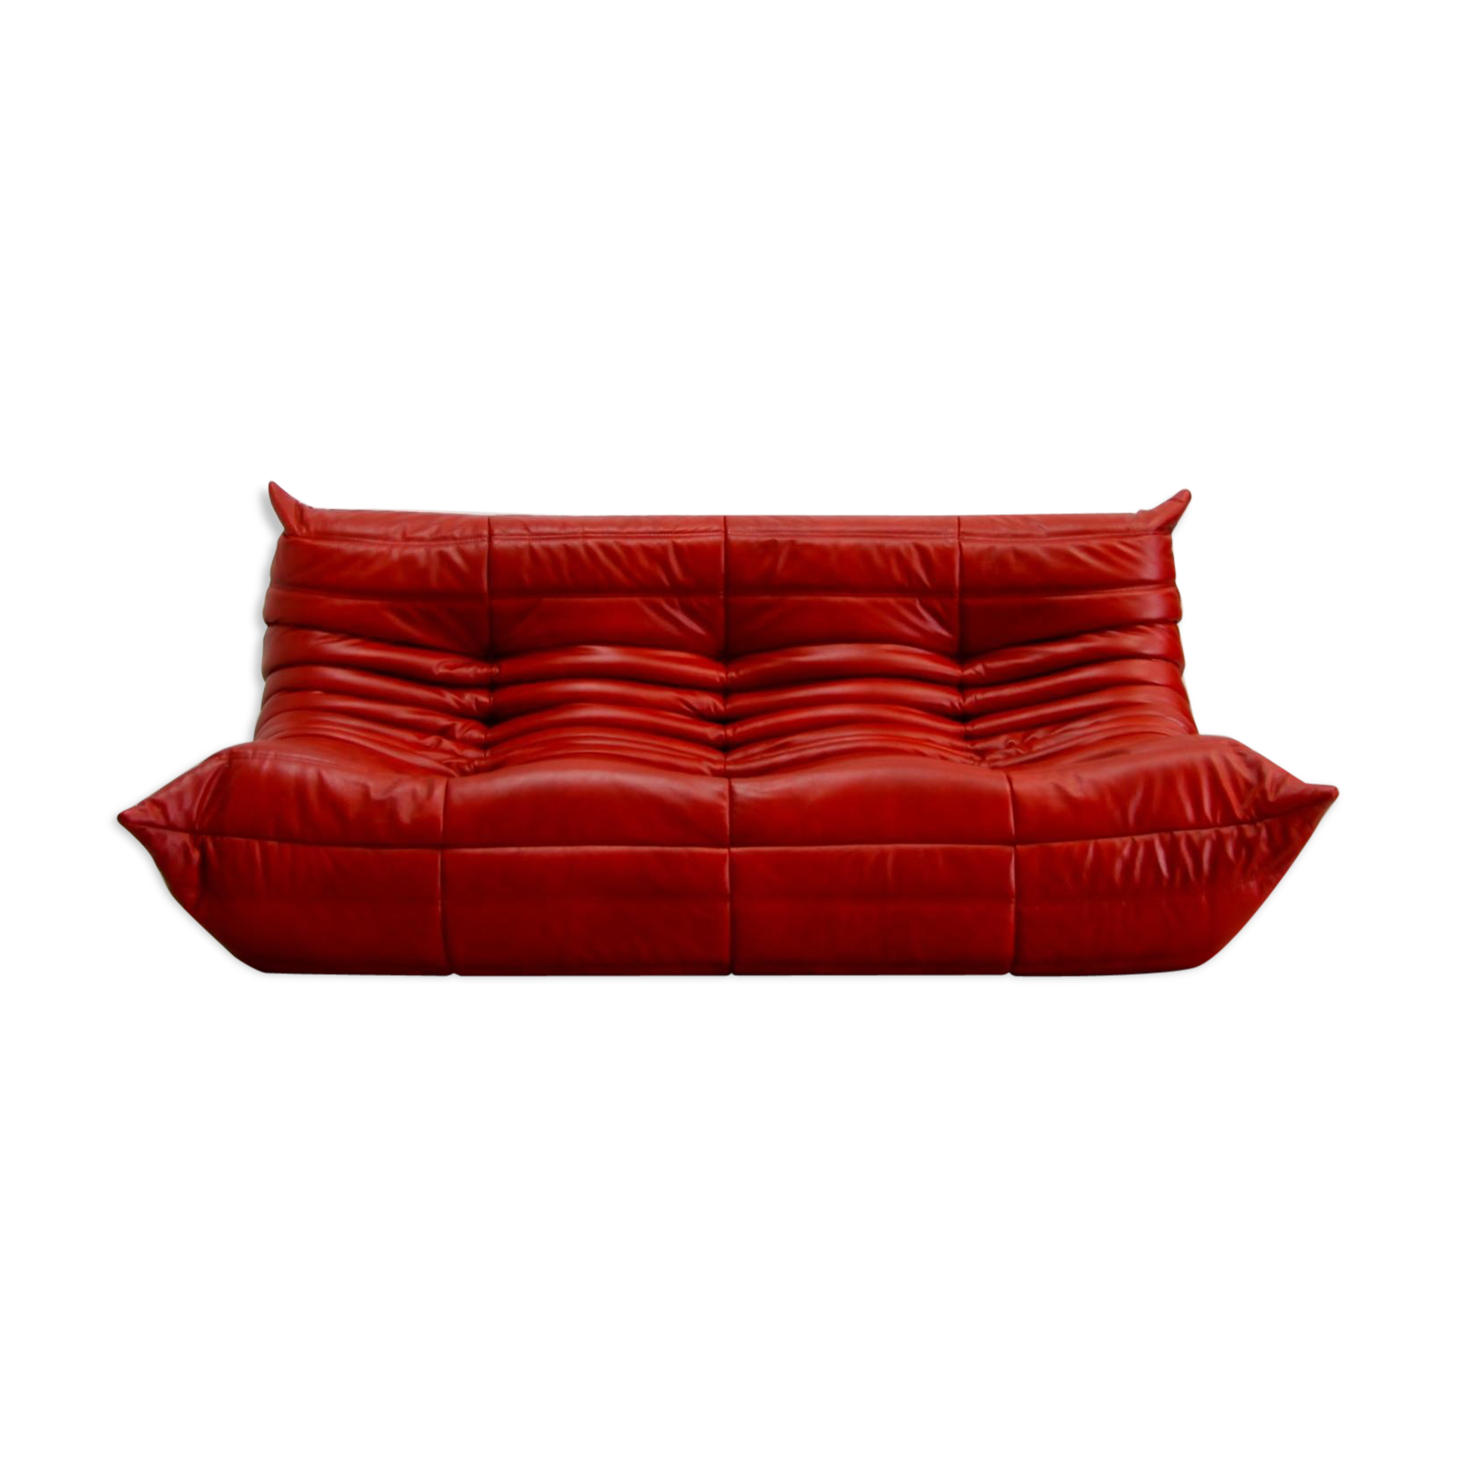 banquette togo cultissime canap togo ligne roset with banquette togo free le canap togo est. Black Bedroom Furniture Sets. Home Design Ideas